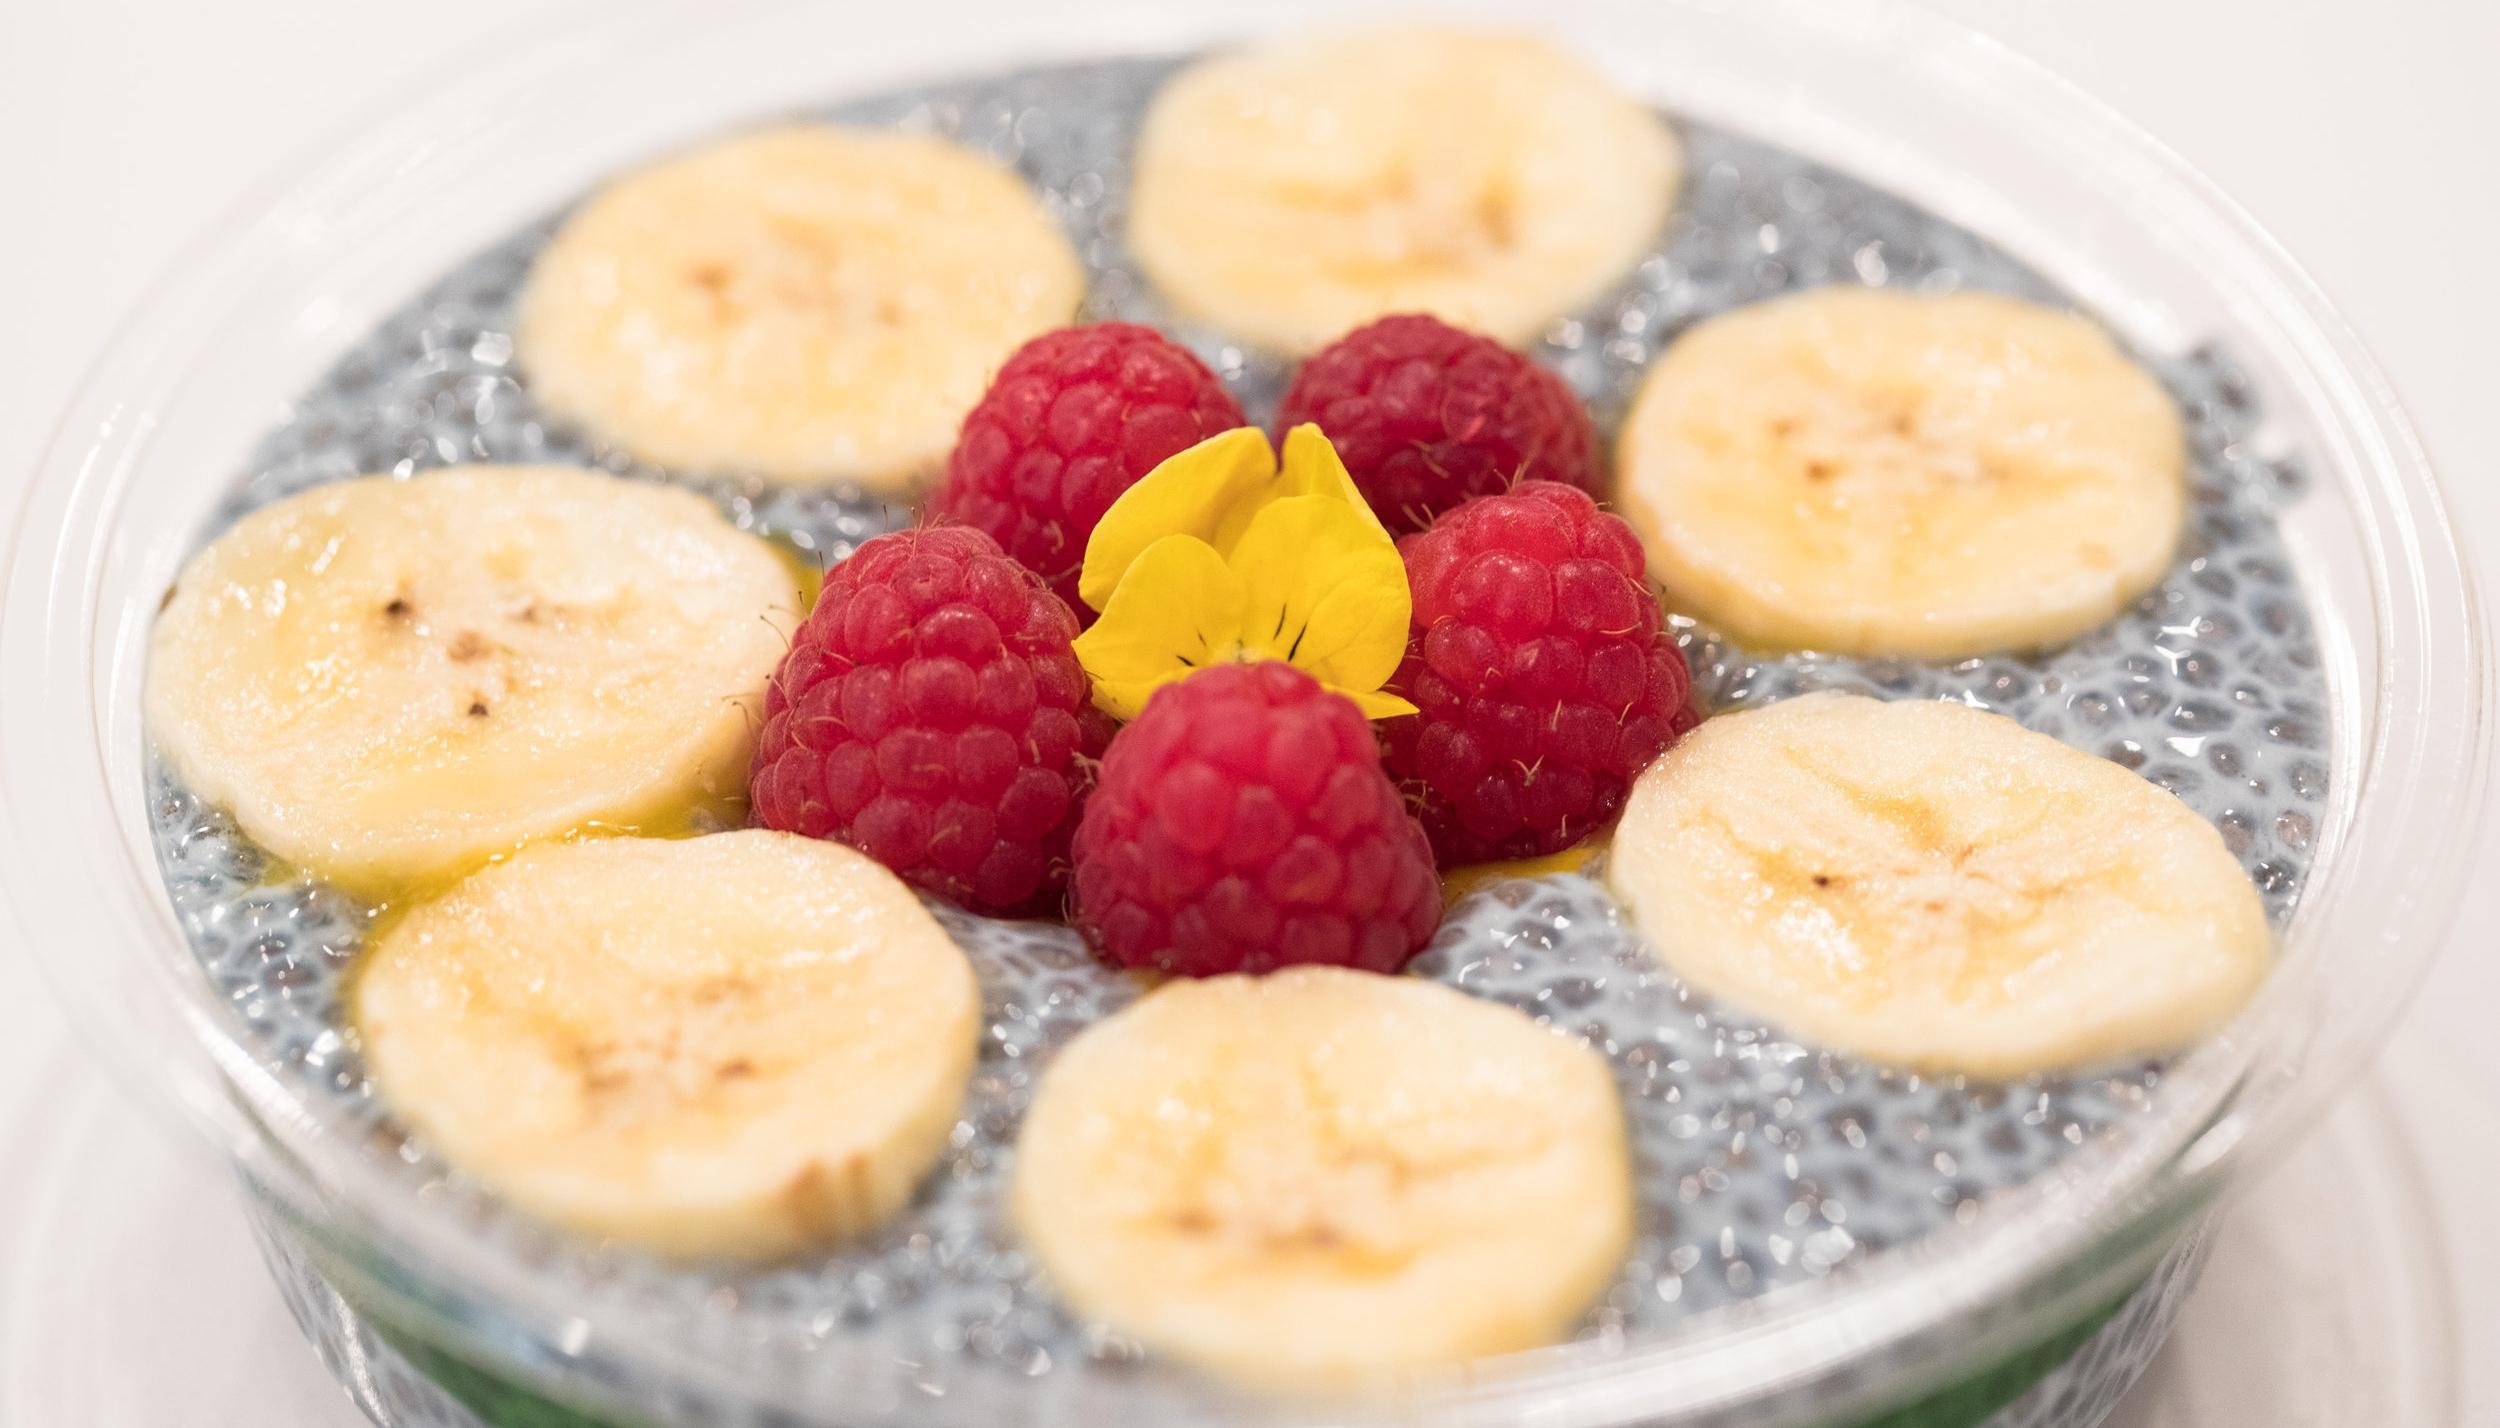 maka-vegan-gluten-free-cafe-breakfast-bowl-6.jpg